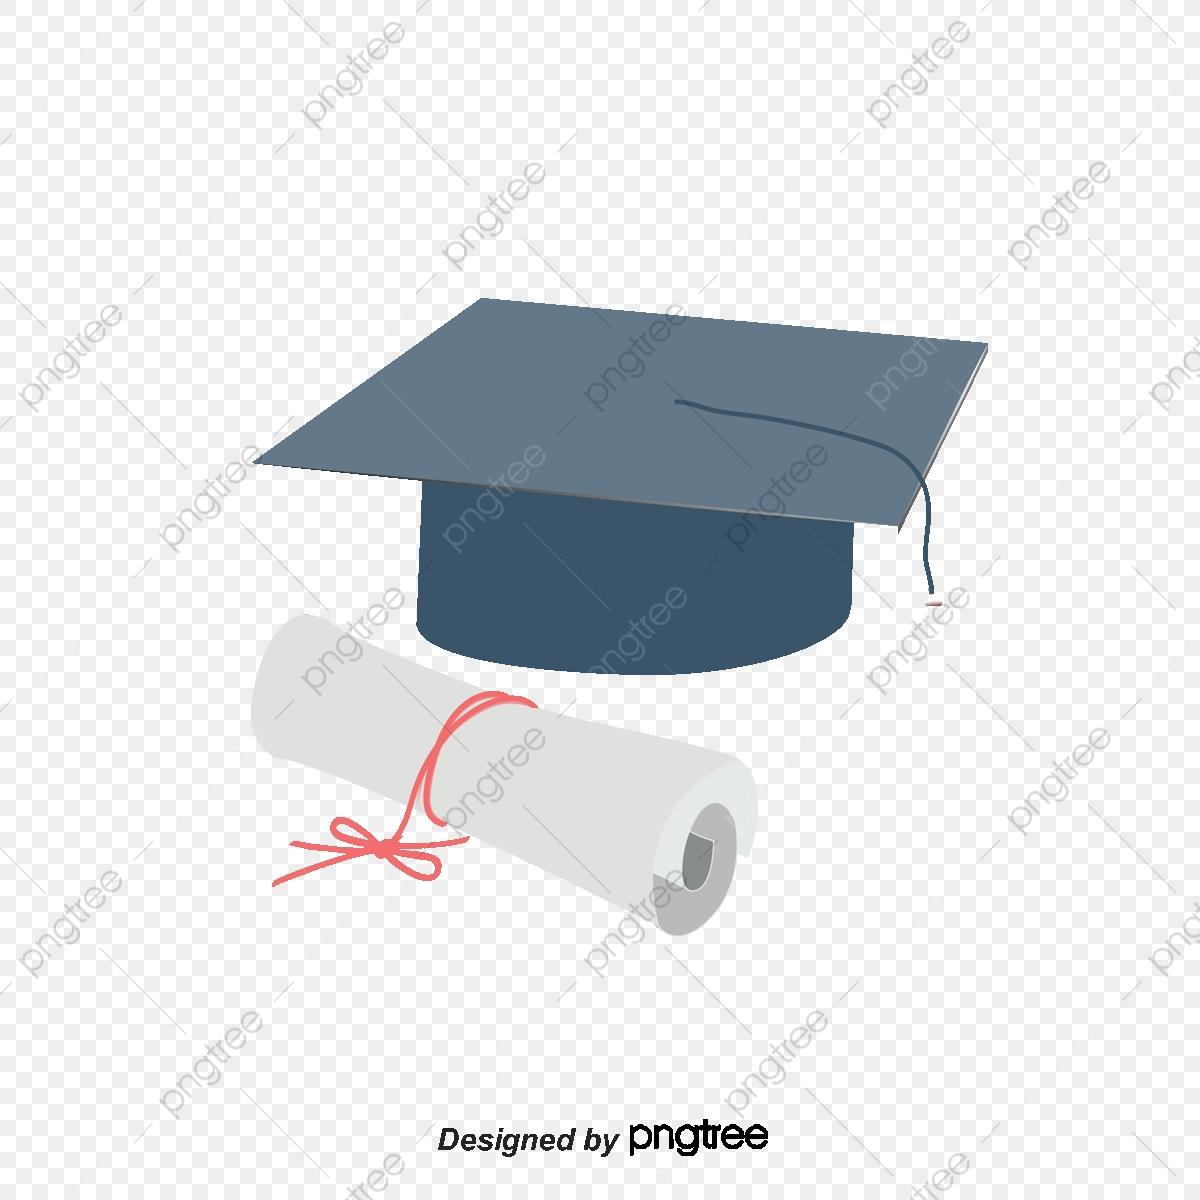 Bachelor Cap And Graduation Certificate Icon, Cap Vector, Graduation.